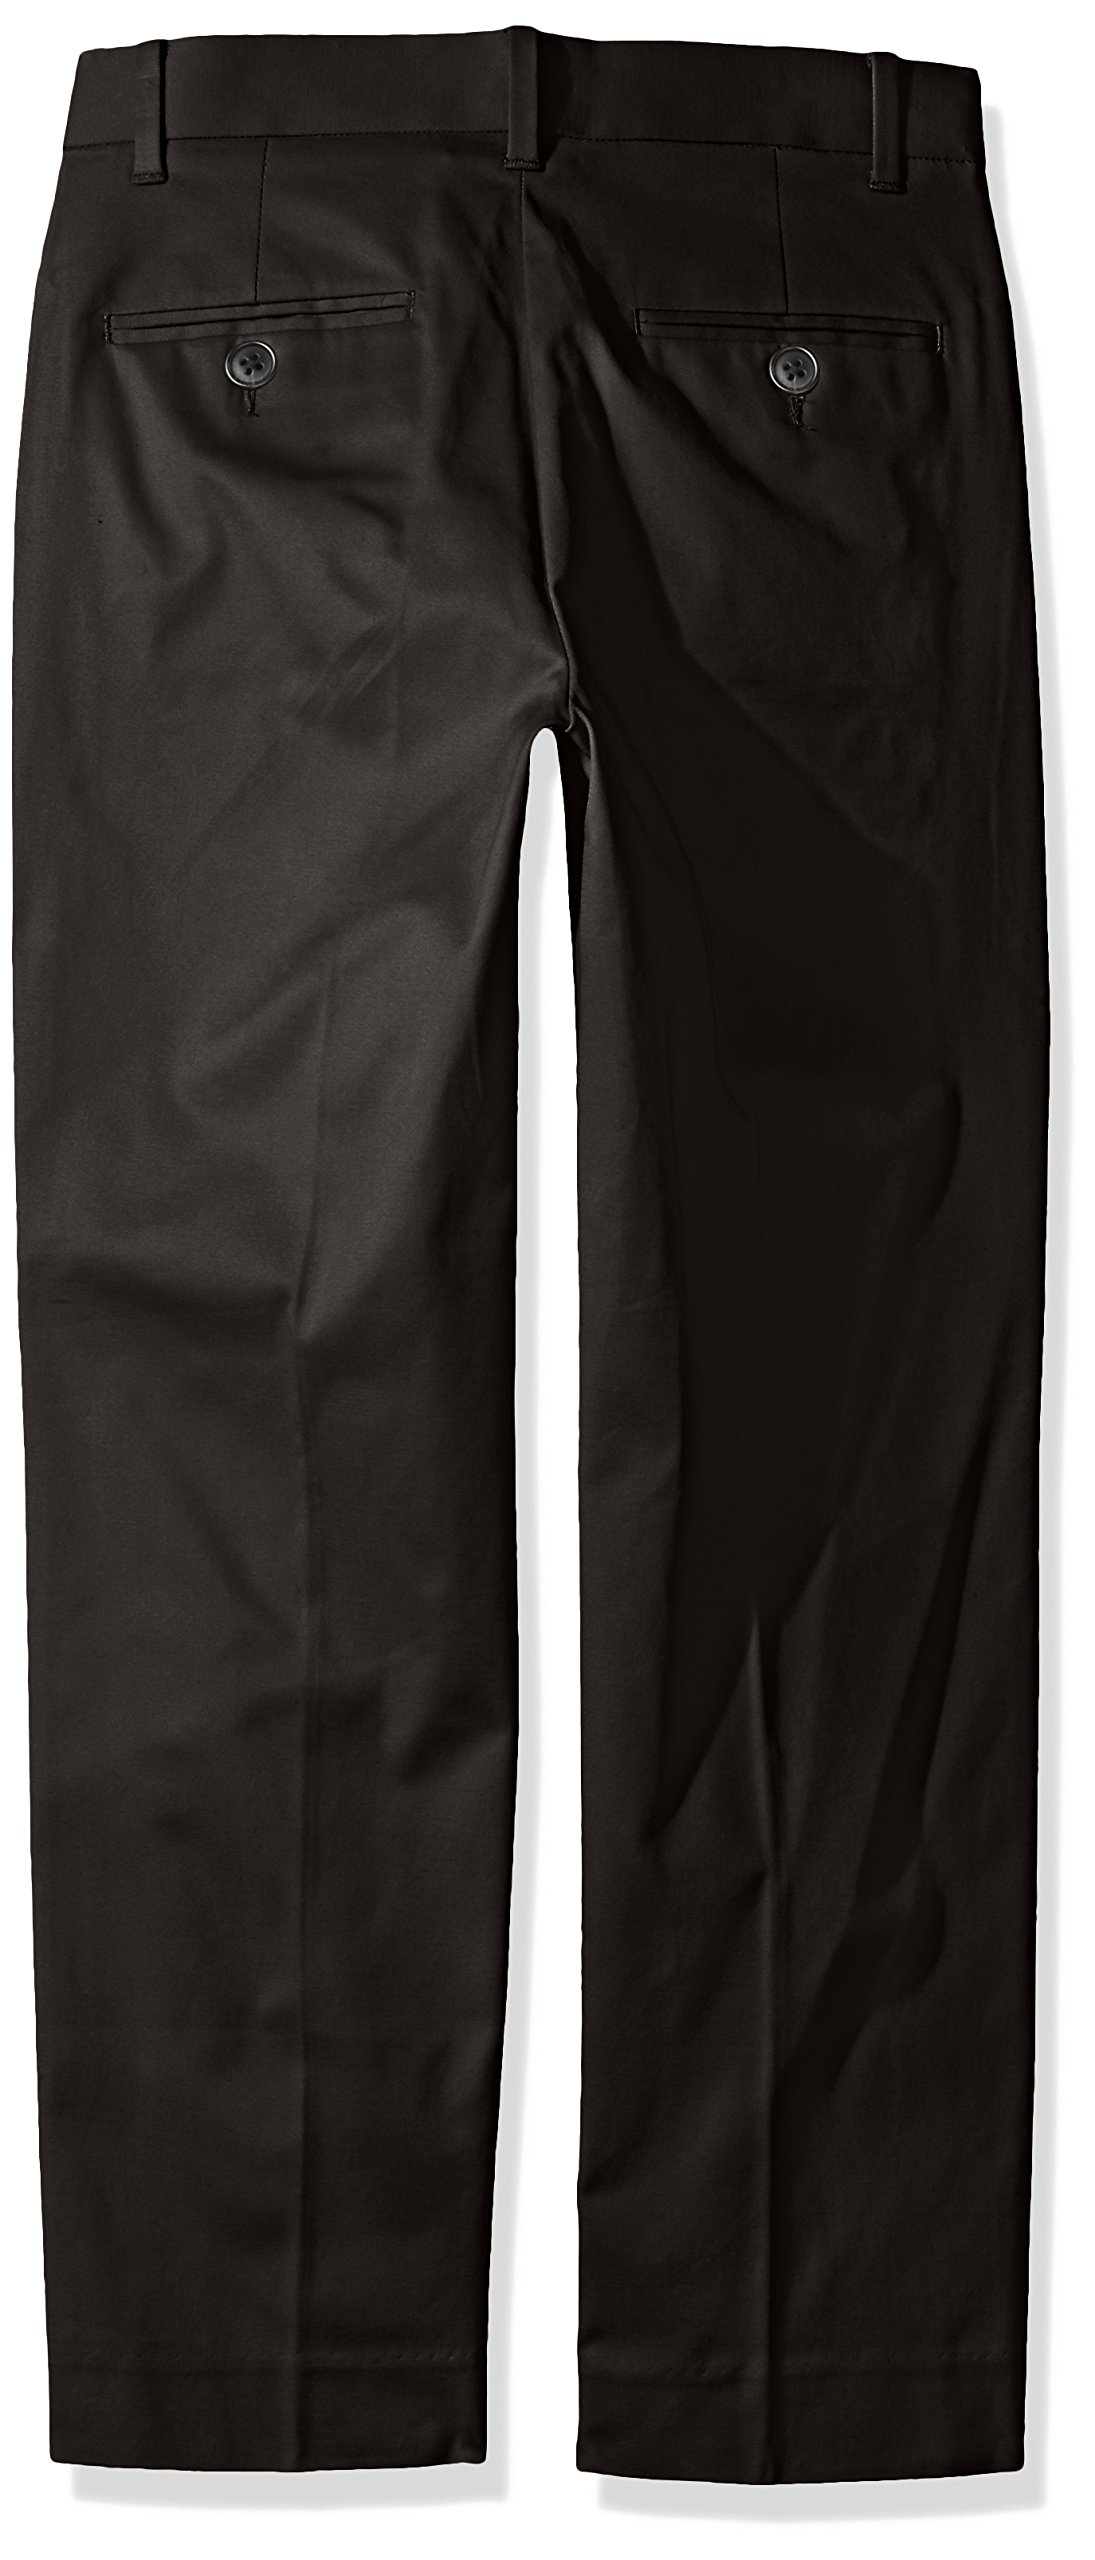 Calvin Klein Little Boys' Fine Line Stretch Twill Pant, Black, 6 by Calvin Klein (Image #2)